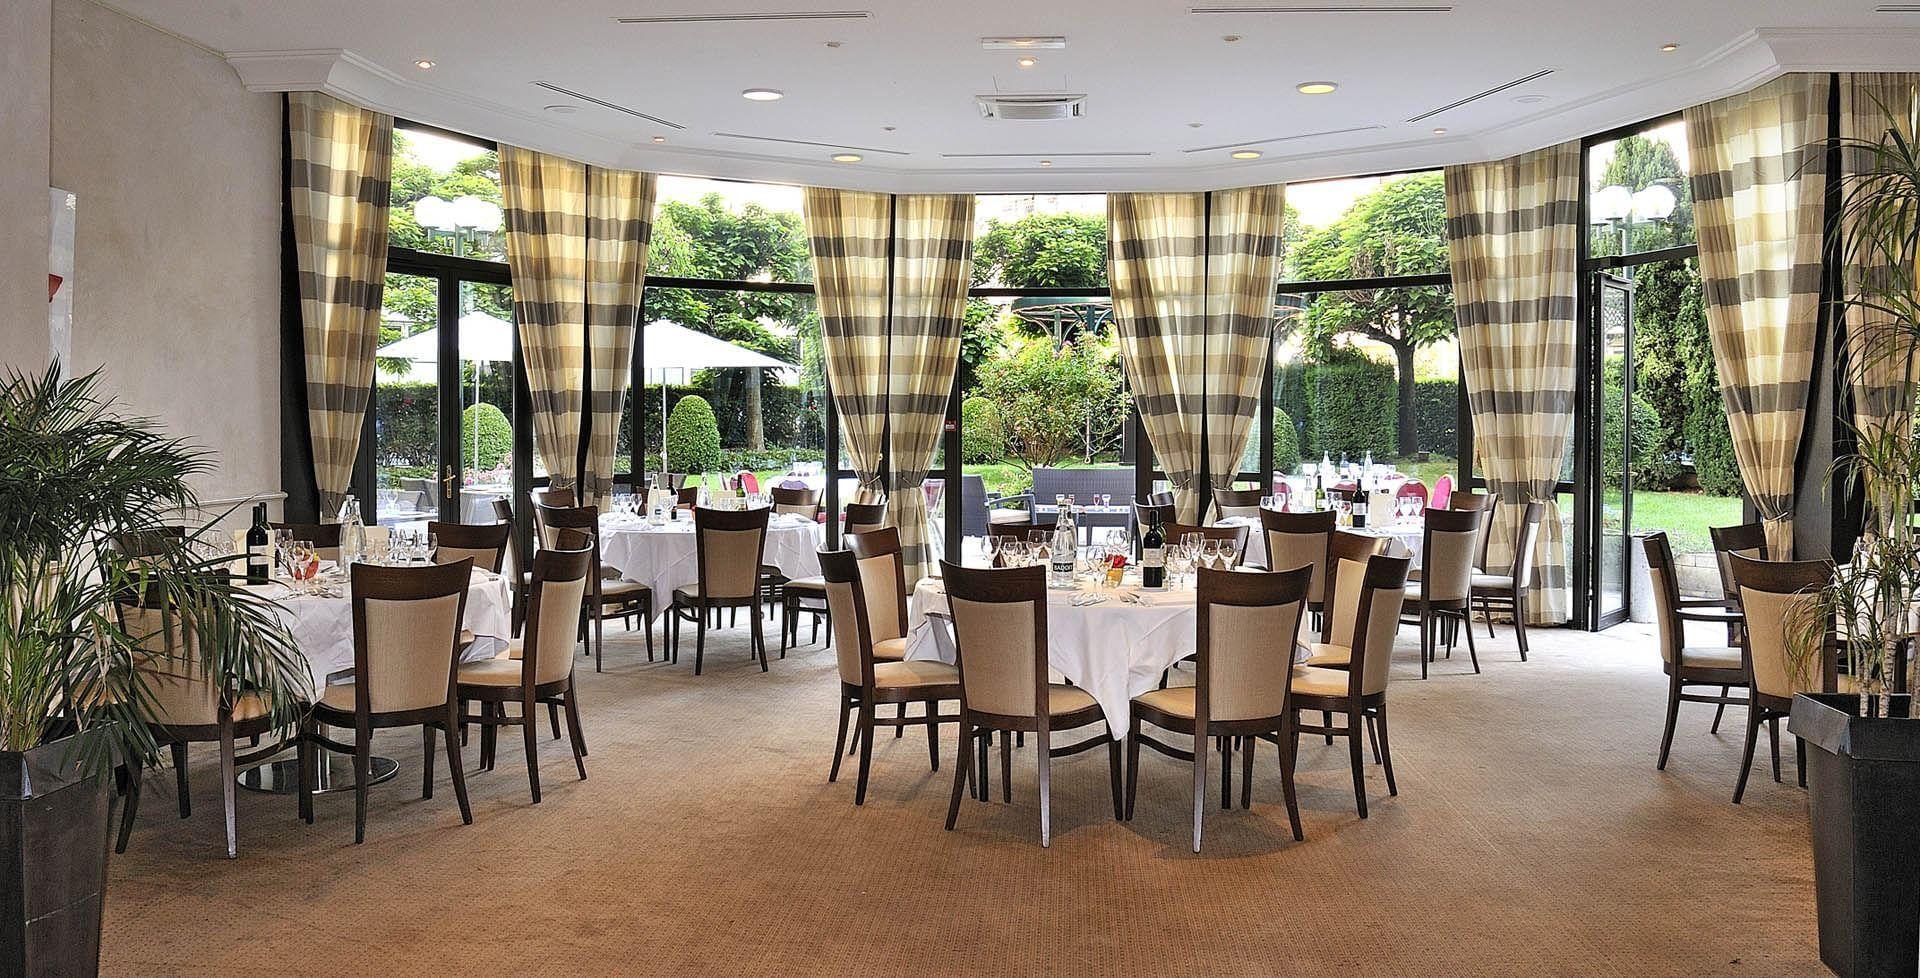 Roseraie banqueting room at Warwick Astrid Lyon